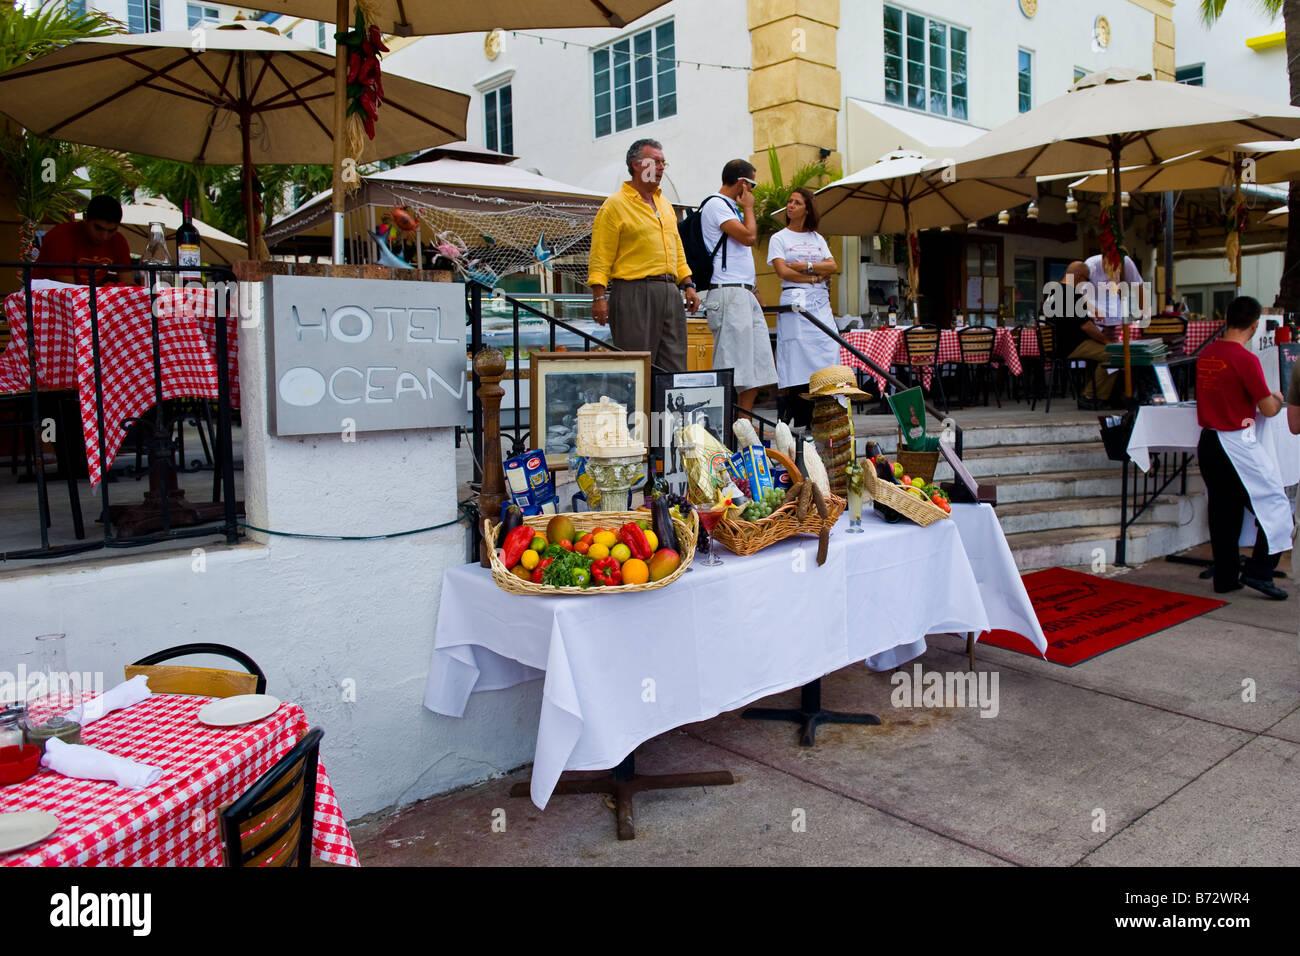 Italian Restaurants Ocean Drive South Beach